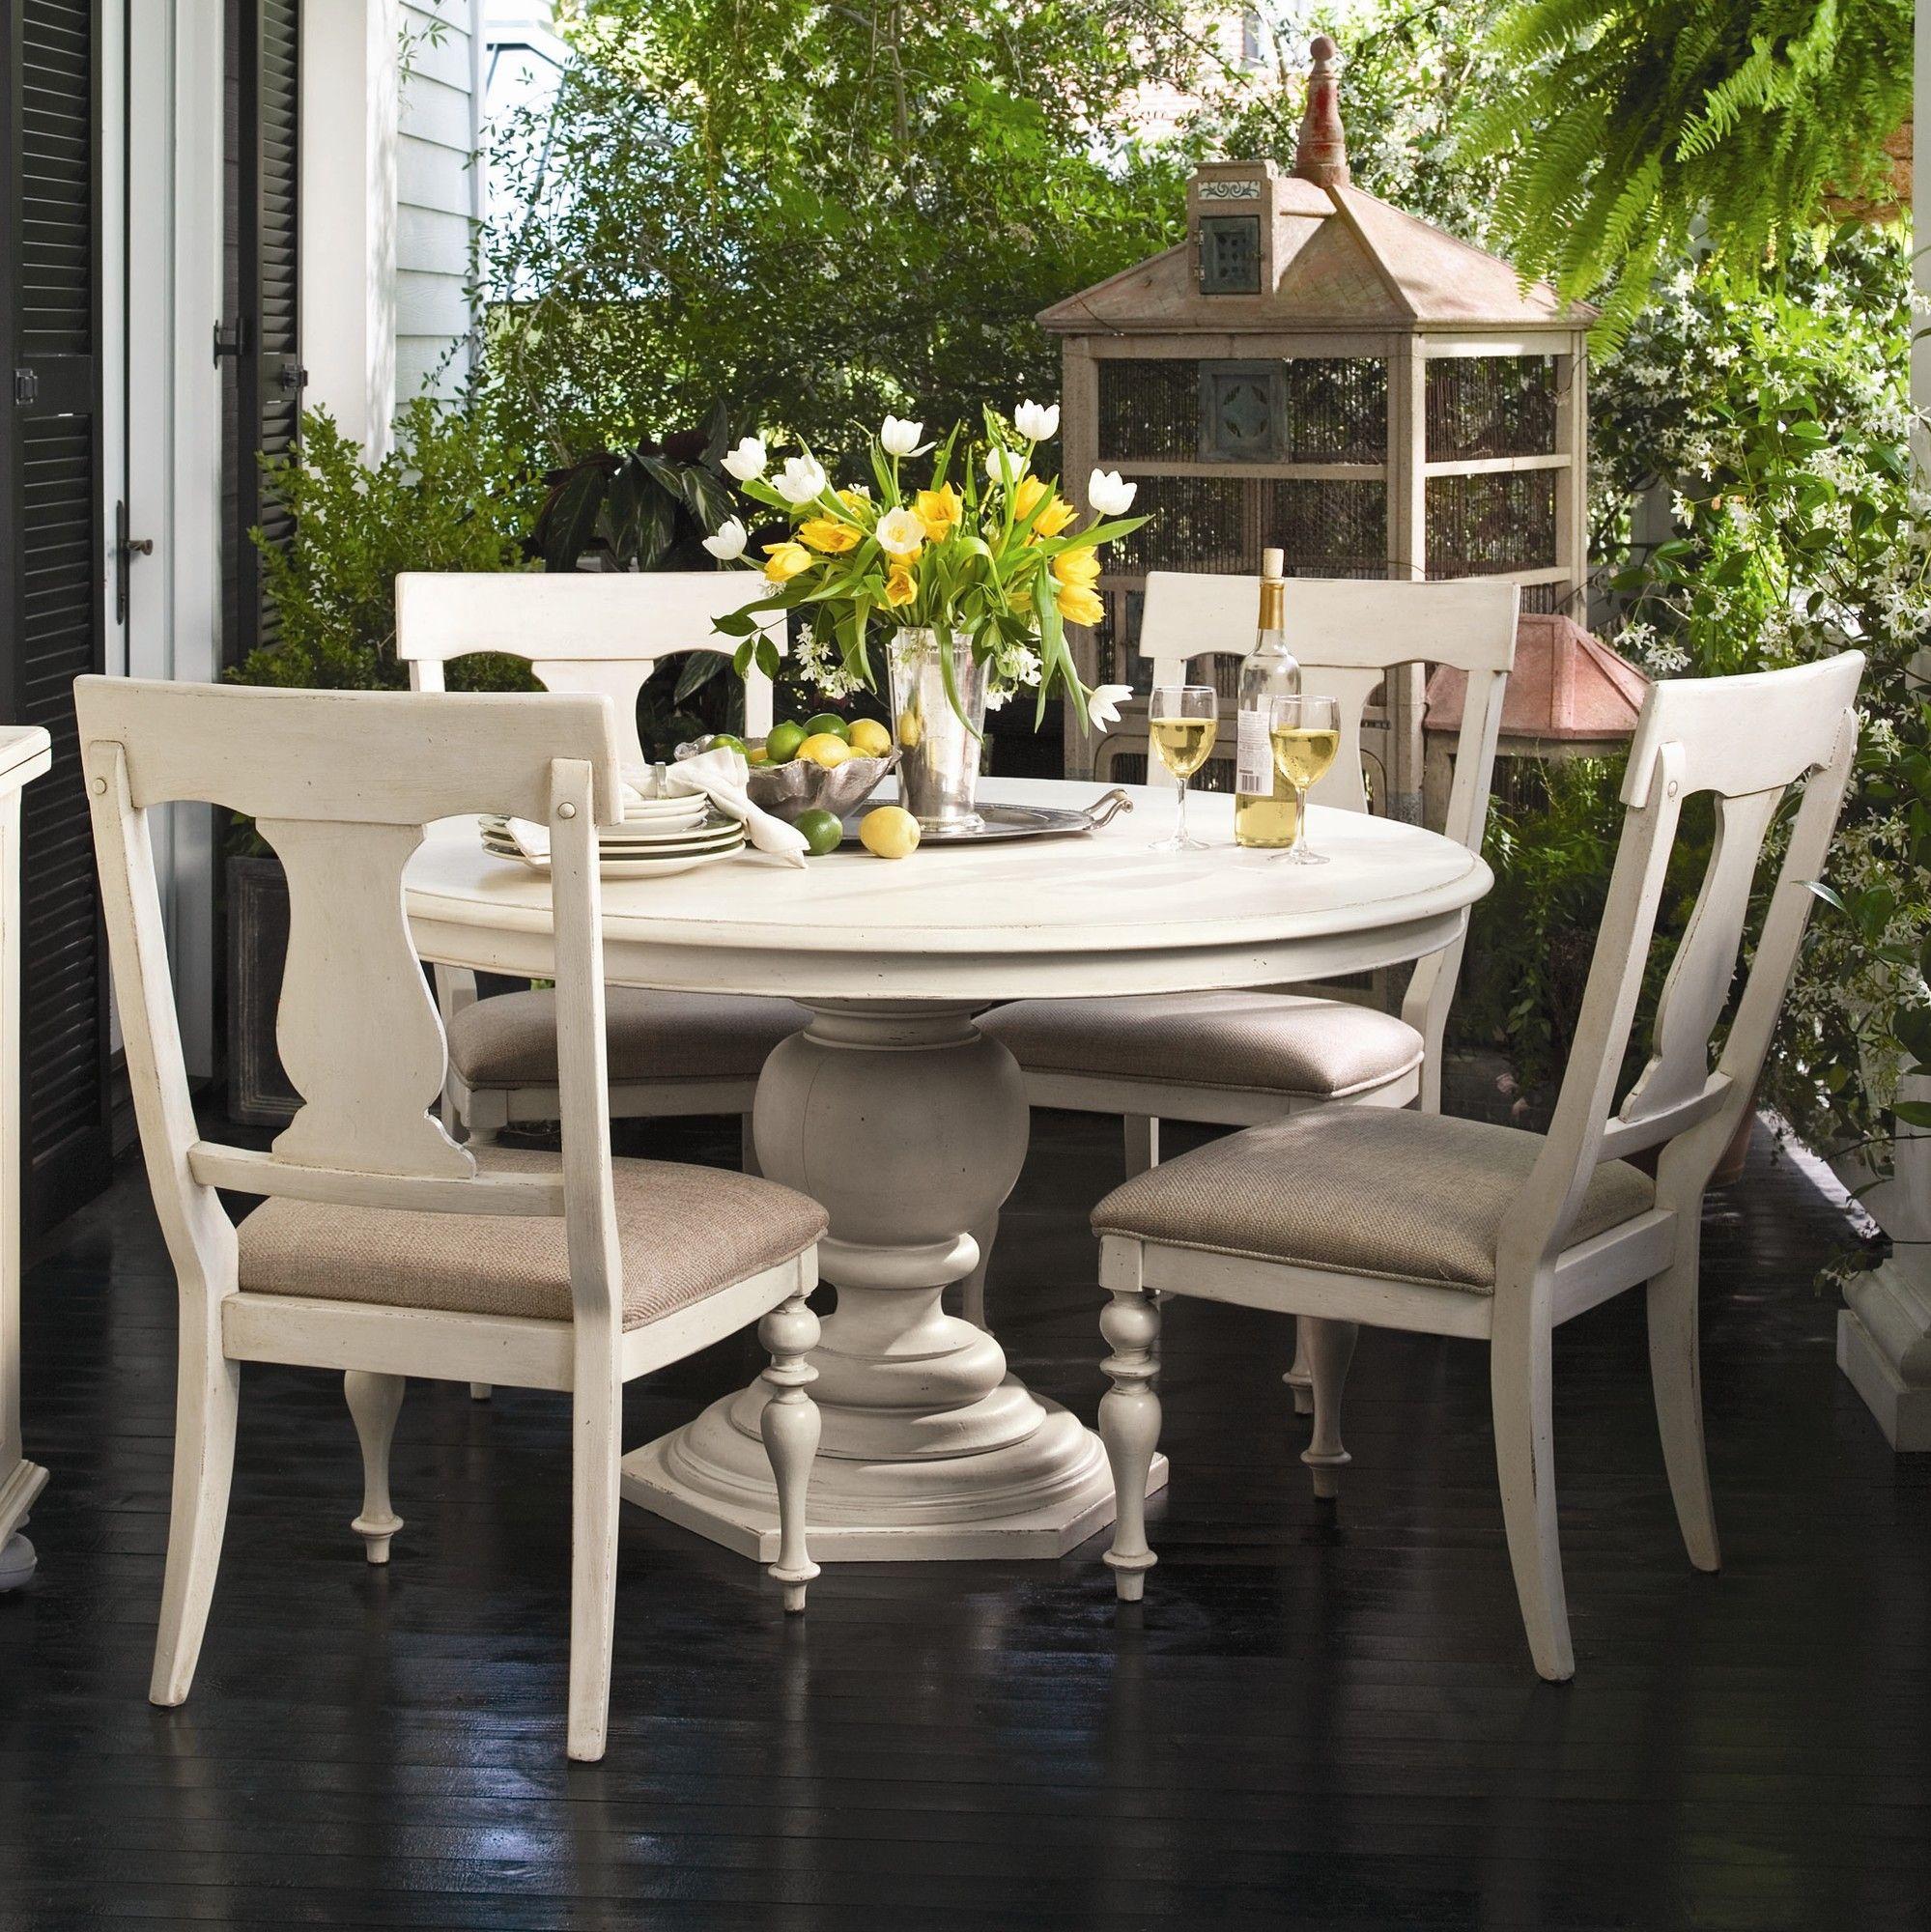 Wayfair.com - Online Home Store for Furniture, Decor, Outdoors ...